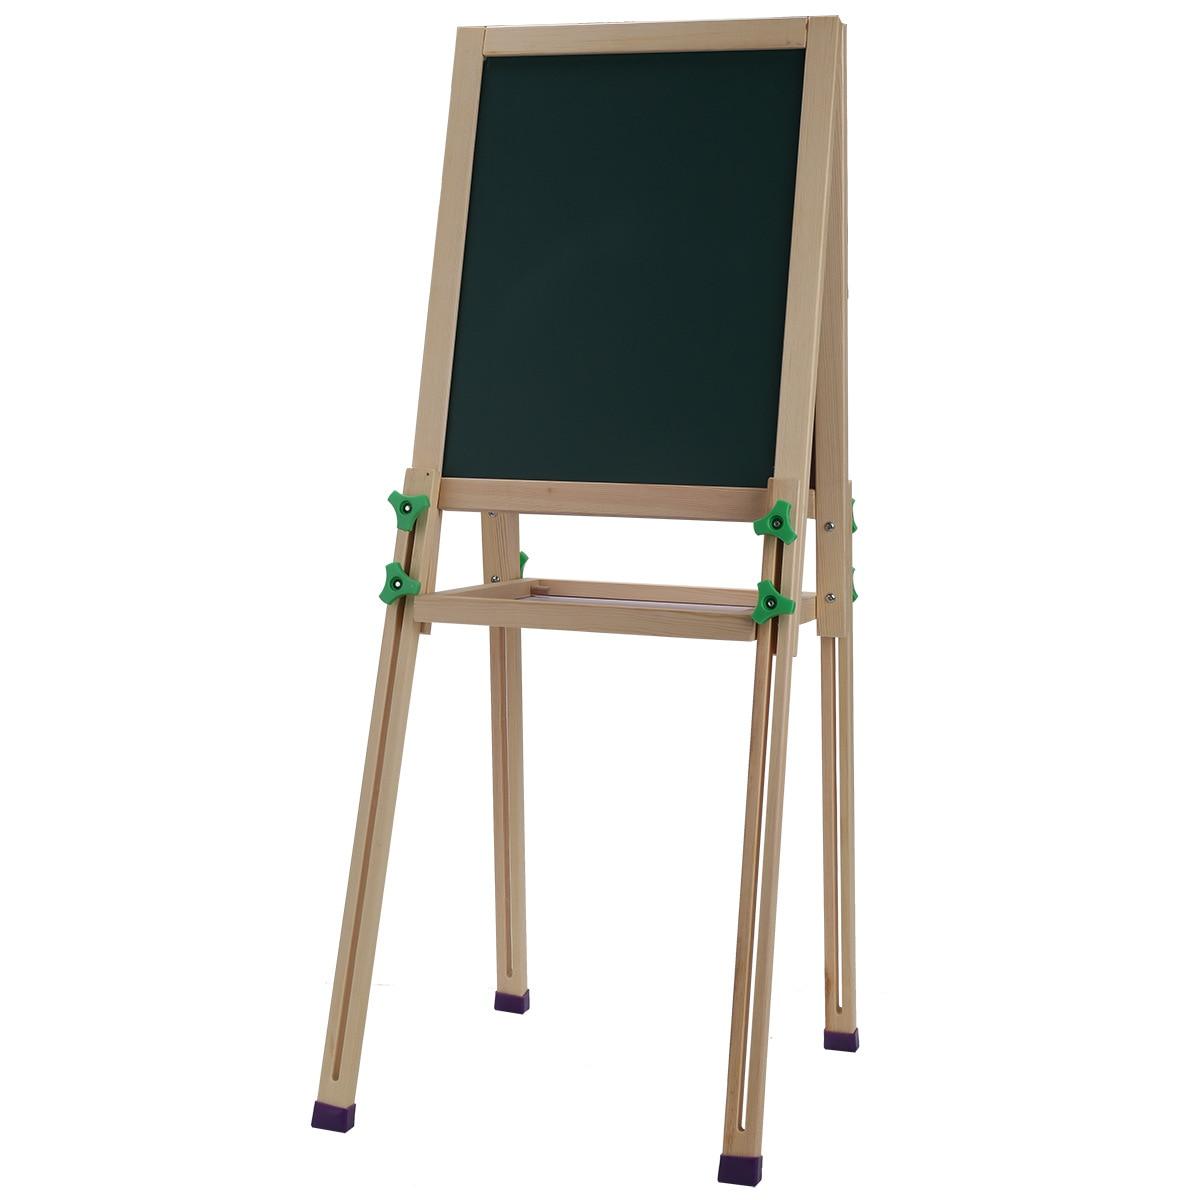 1 Pcs Deli Children Wood Easel Art Double Small Blackboard Scaffolding Painting Office School Supplies Stationery deli heavy duty hole punch office school supplies stationery 0150